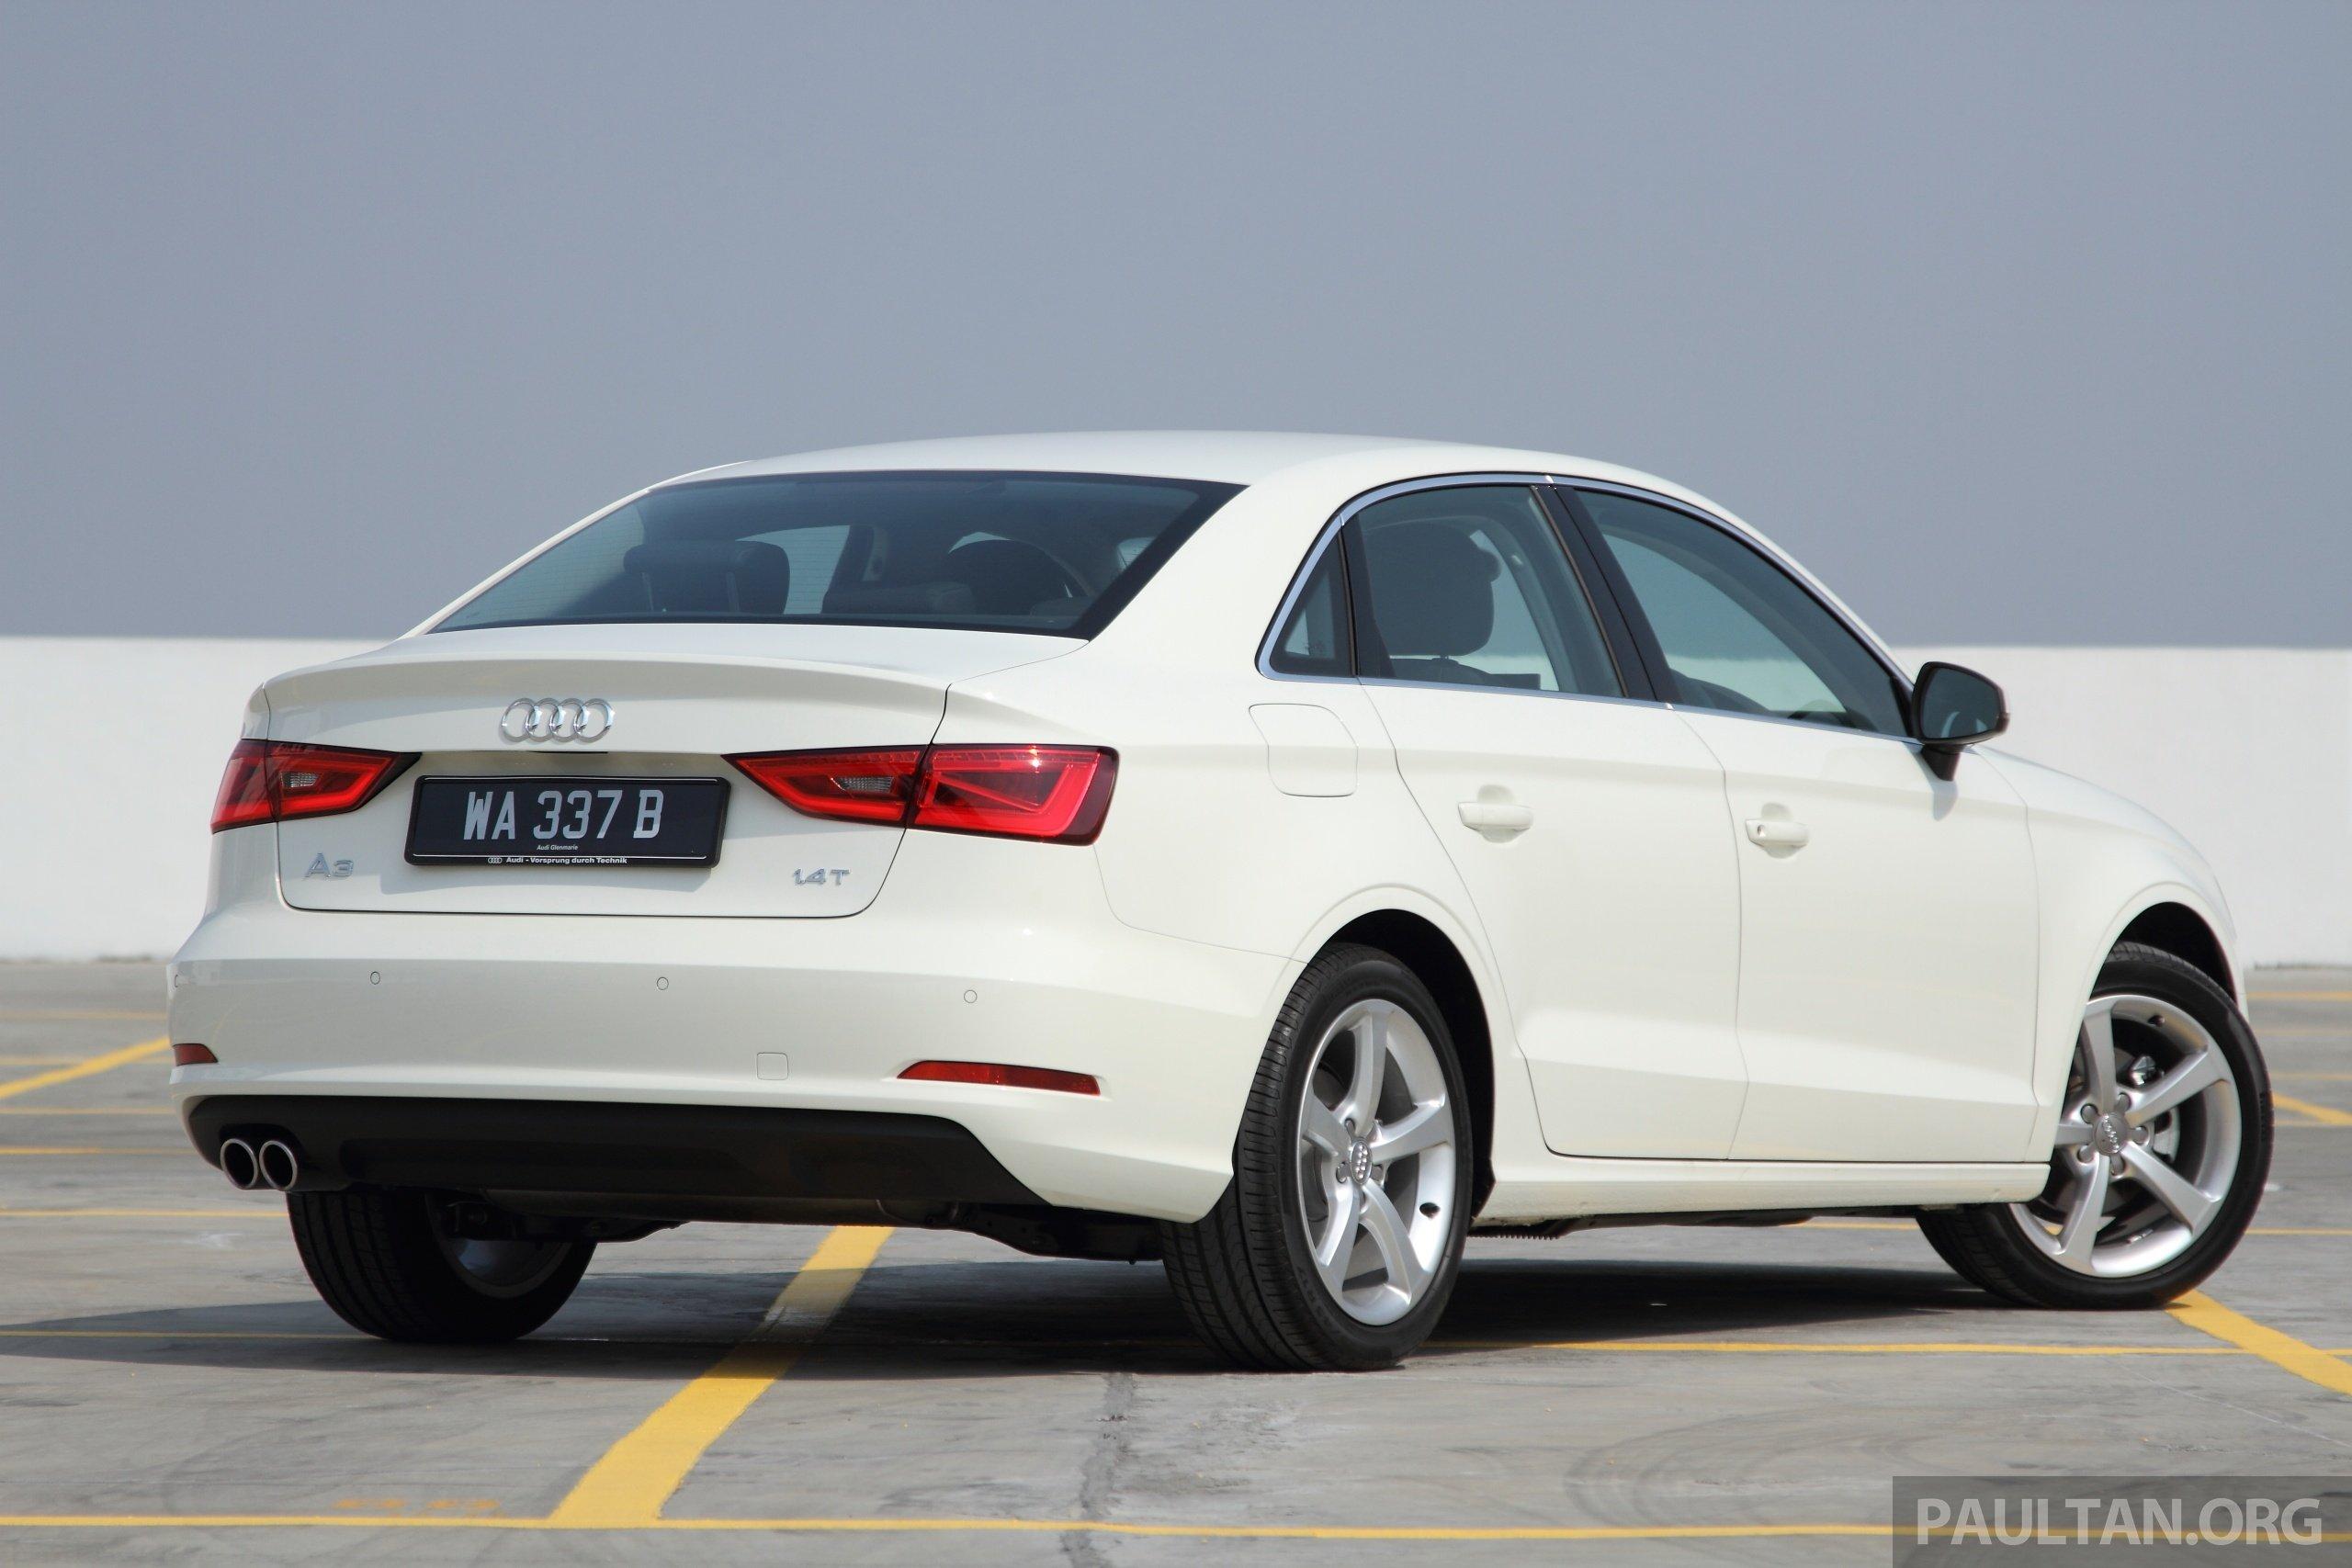 Audi A3 Sedan Now On Sale 2 Variants From Rm180k Image